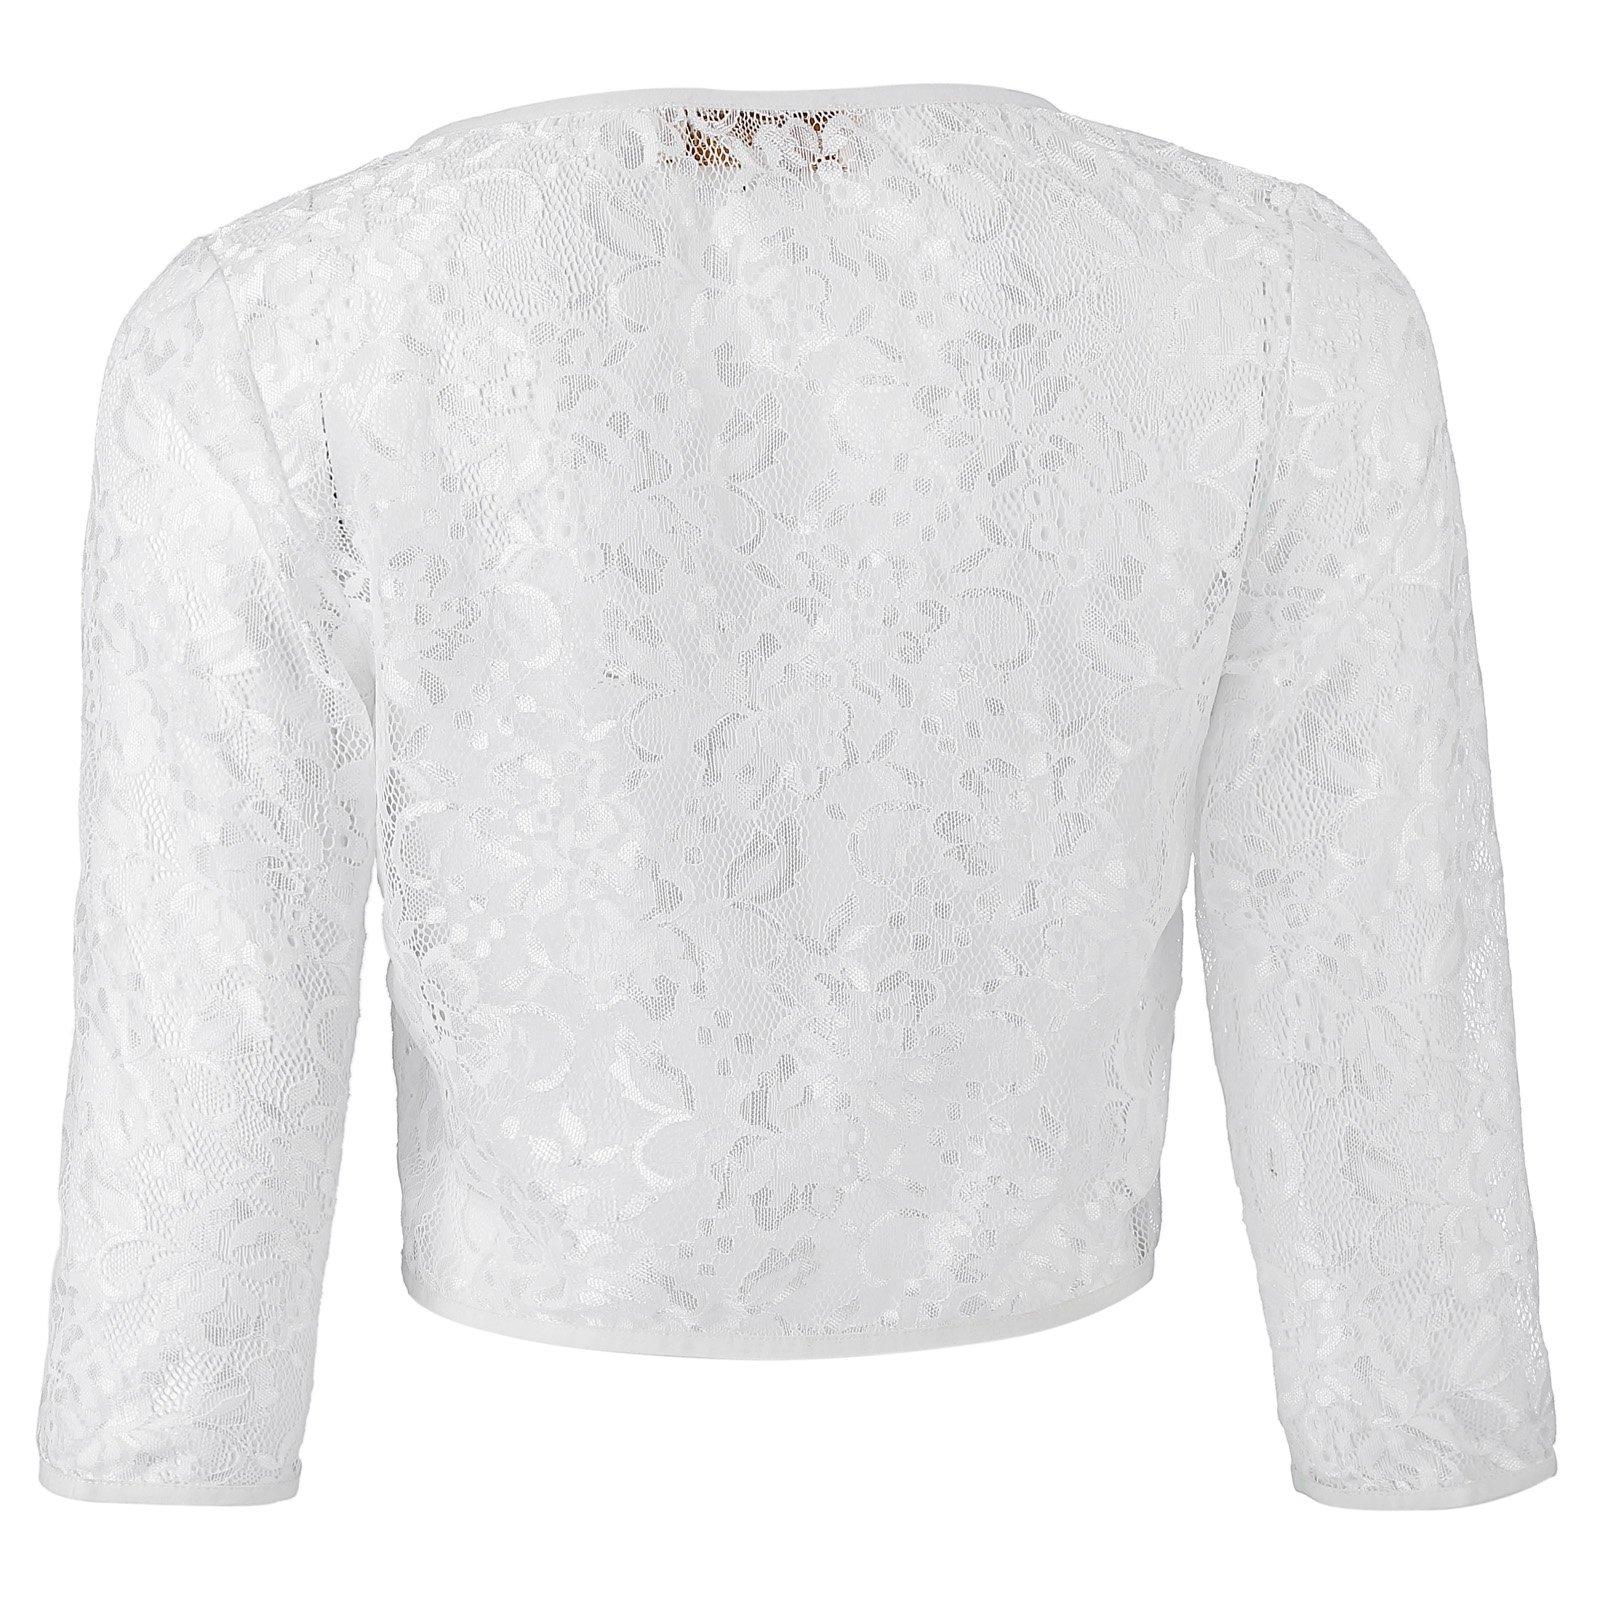 Kate Kasin Short Crochet Bolero Floral Lace Cardigan Top for Women (White, 2XL) KK430-2 by Kate Kasin (Image #2)